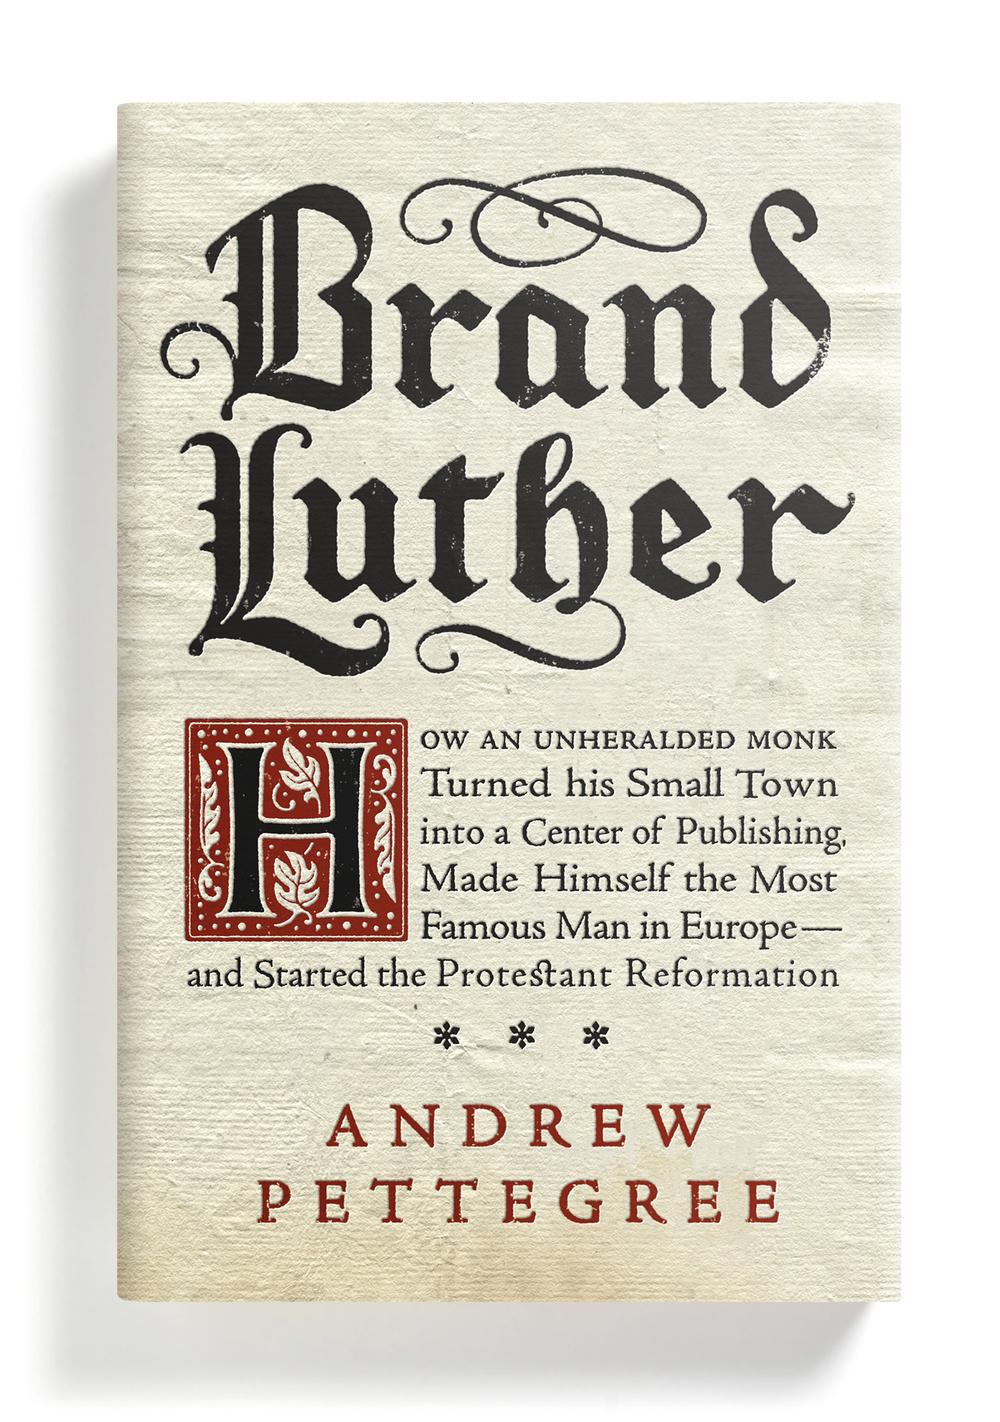 BrandLuther.jpg